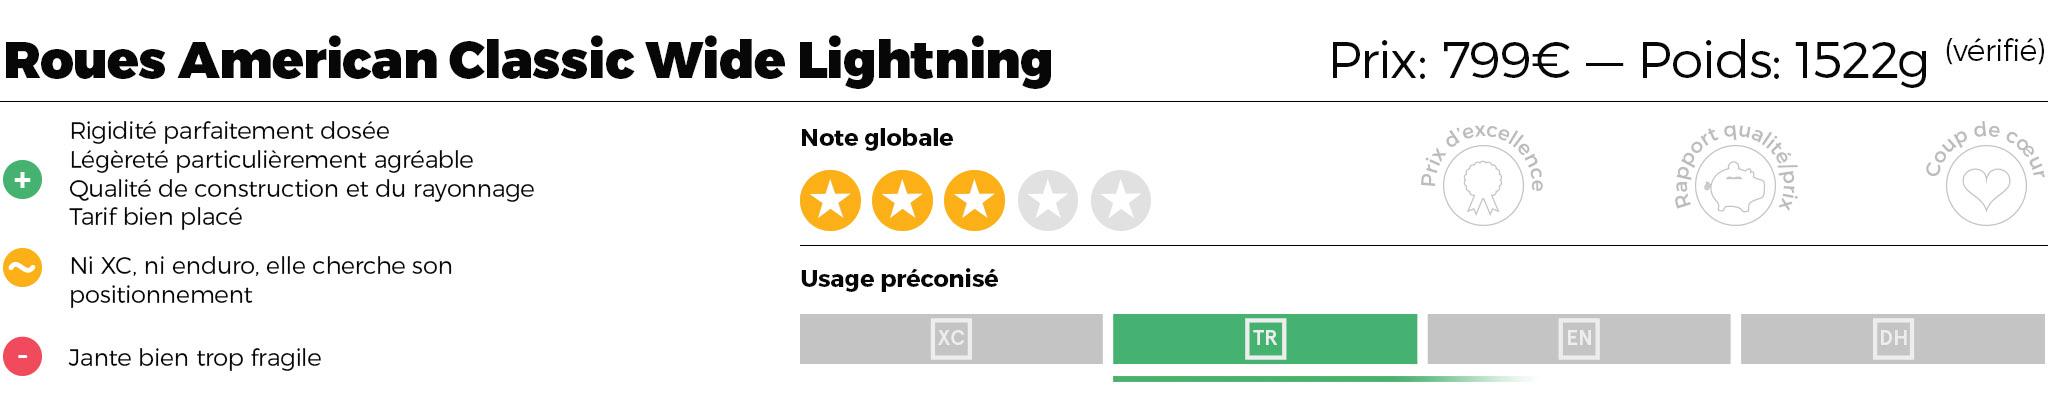 bloc-test_roues_amc_wide_lightning